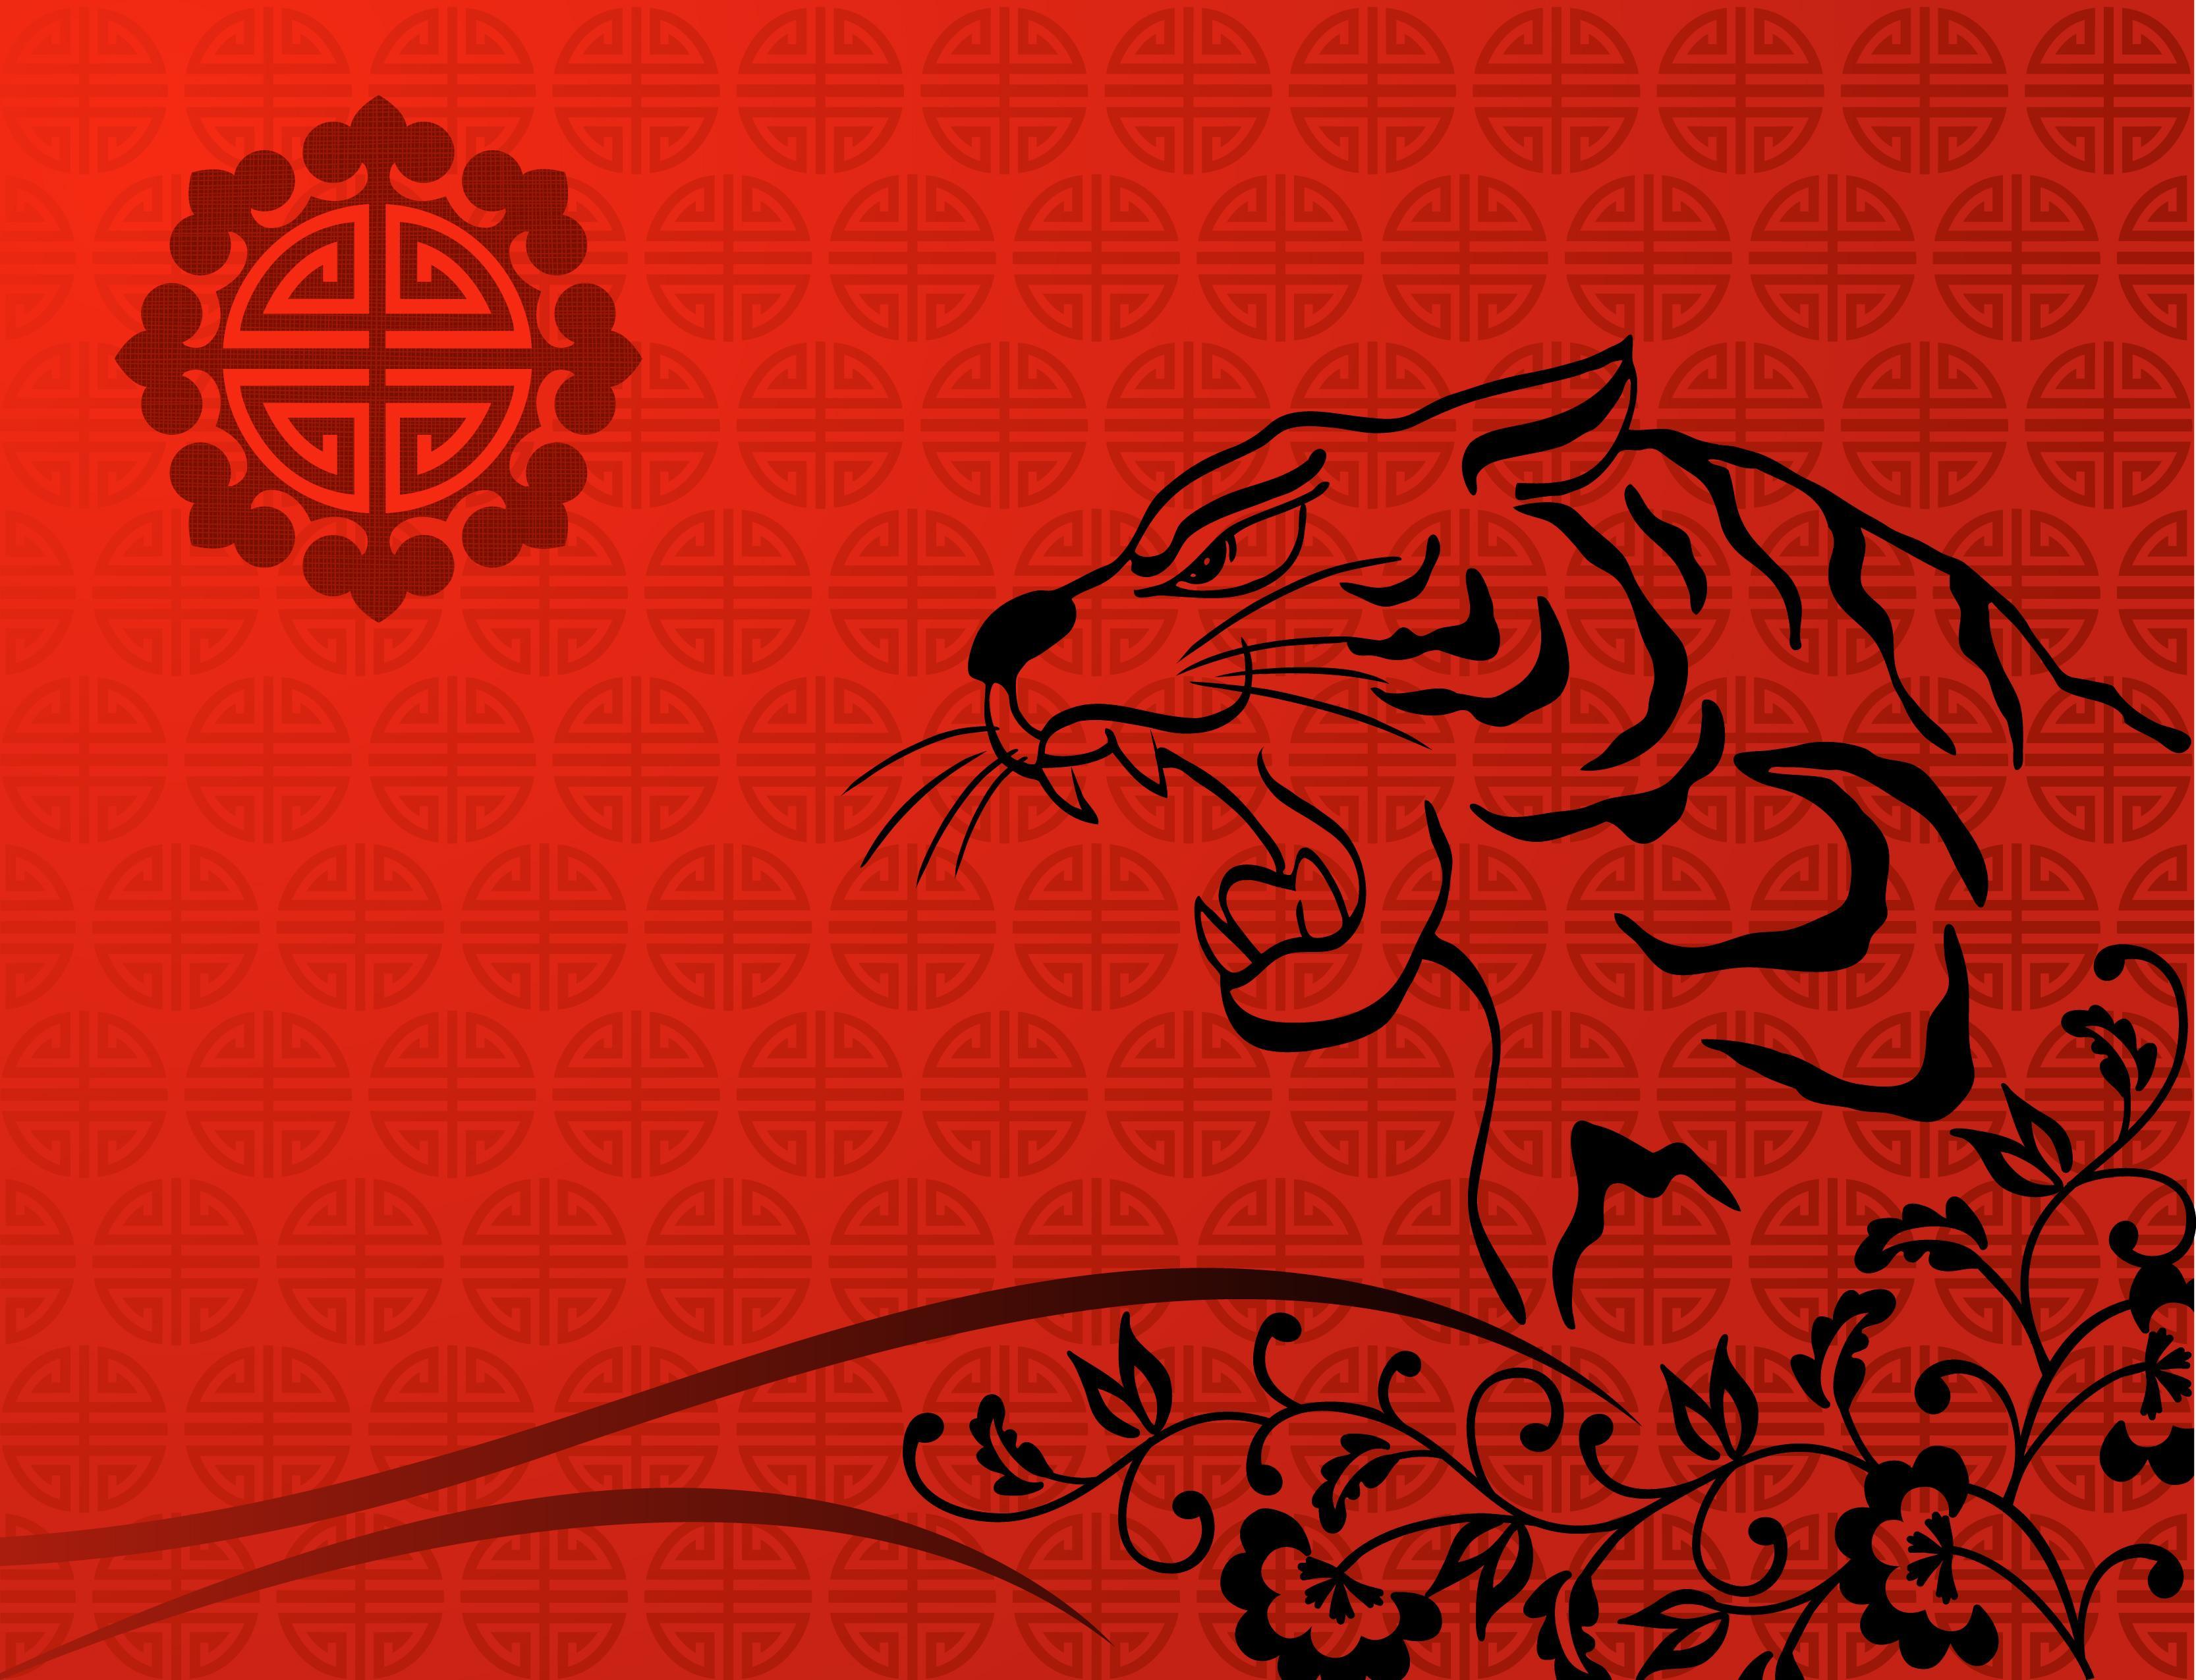 Ảnh Background cổ trang con hổ